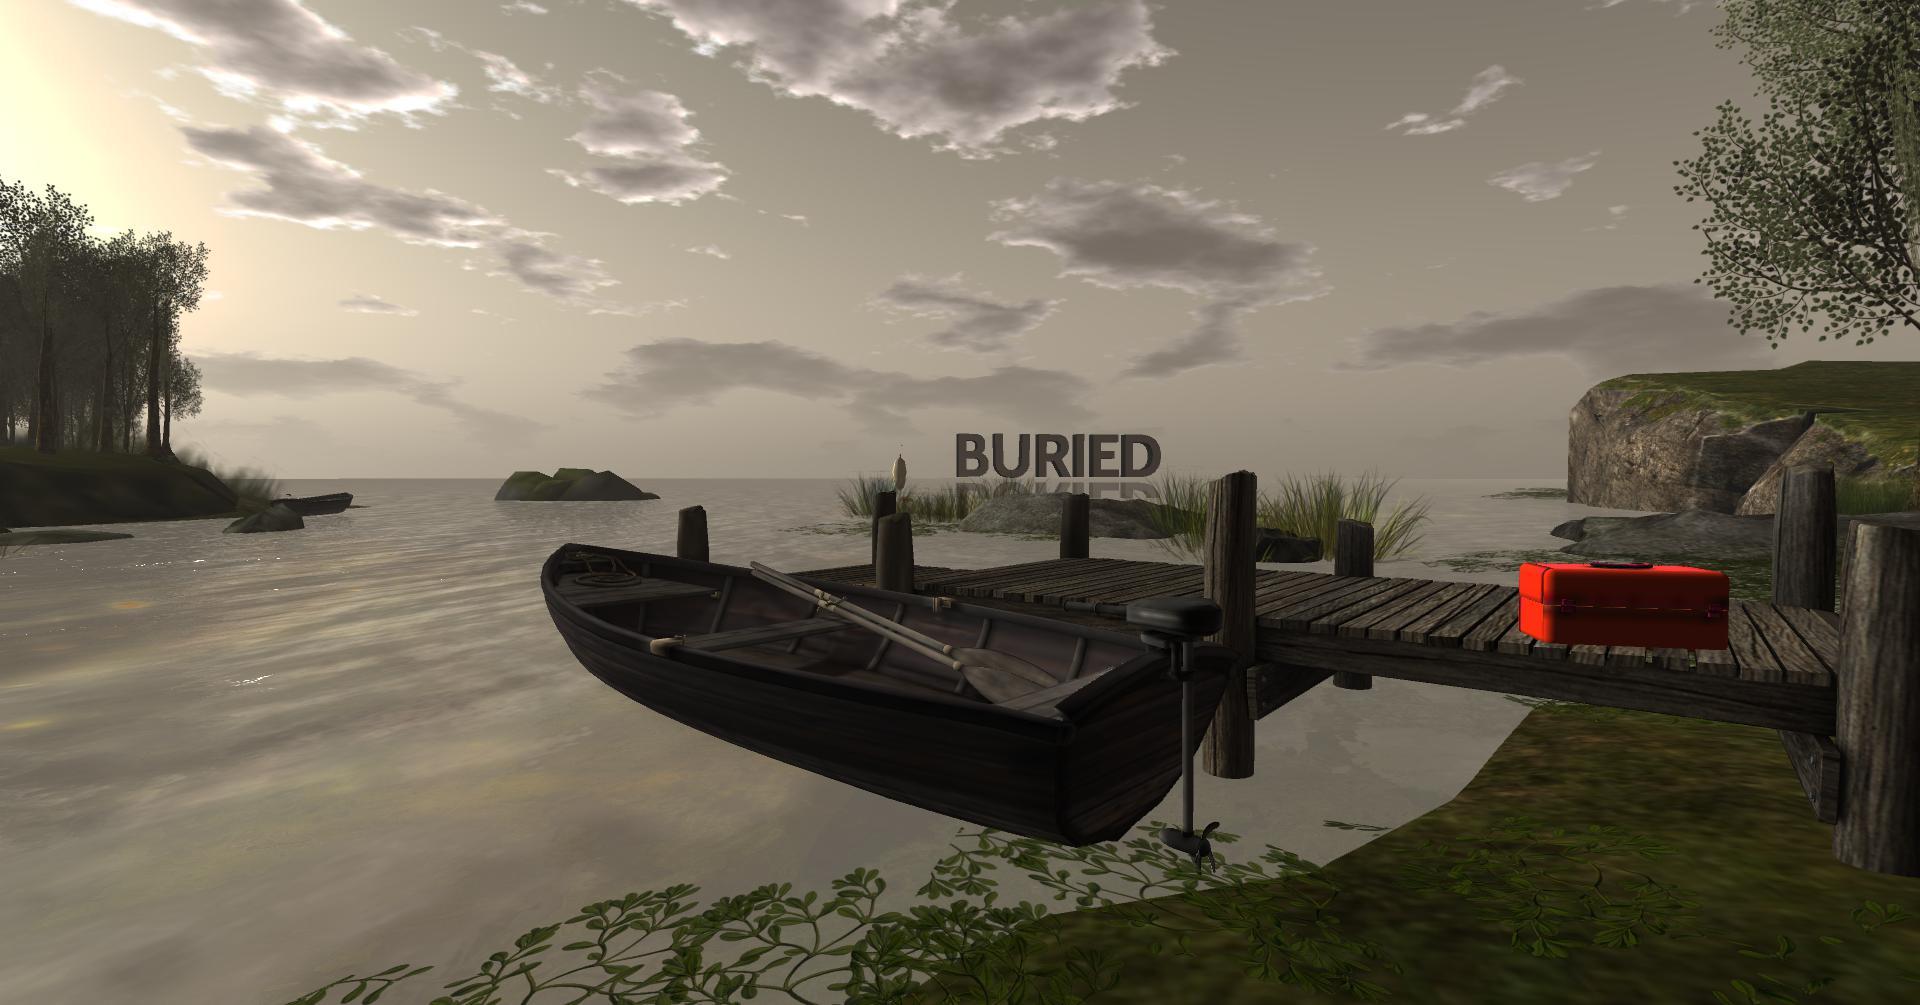 Buried hud_002